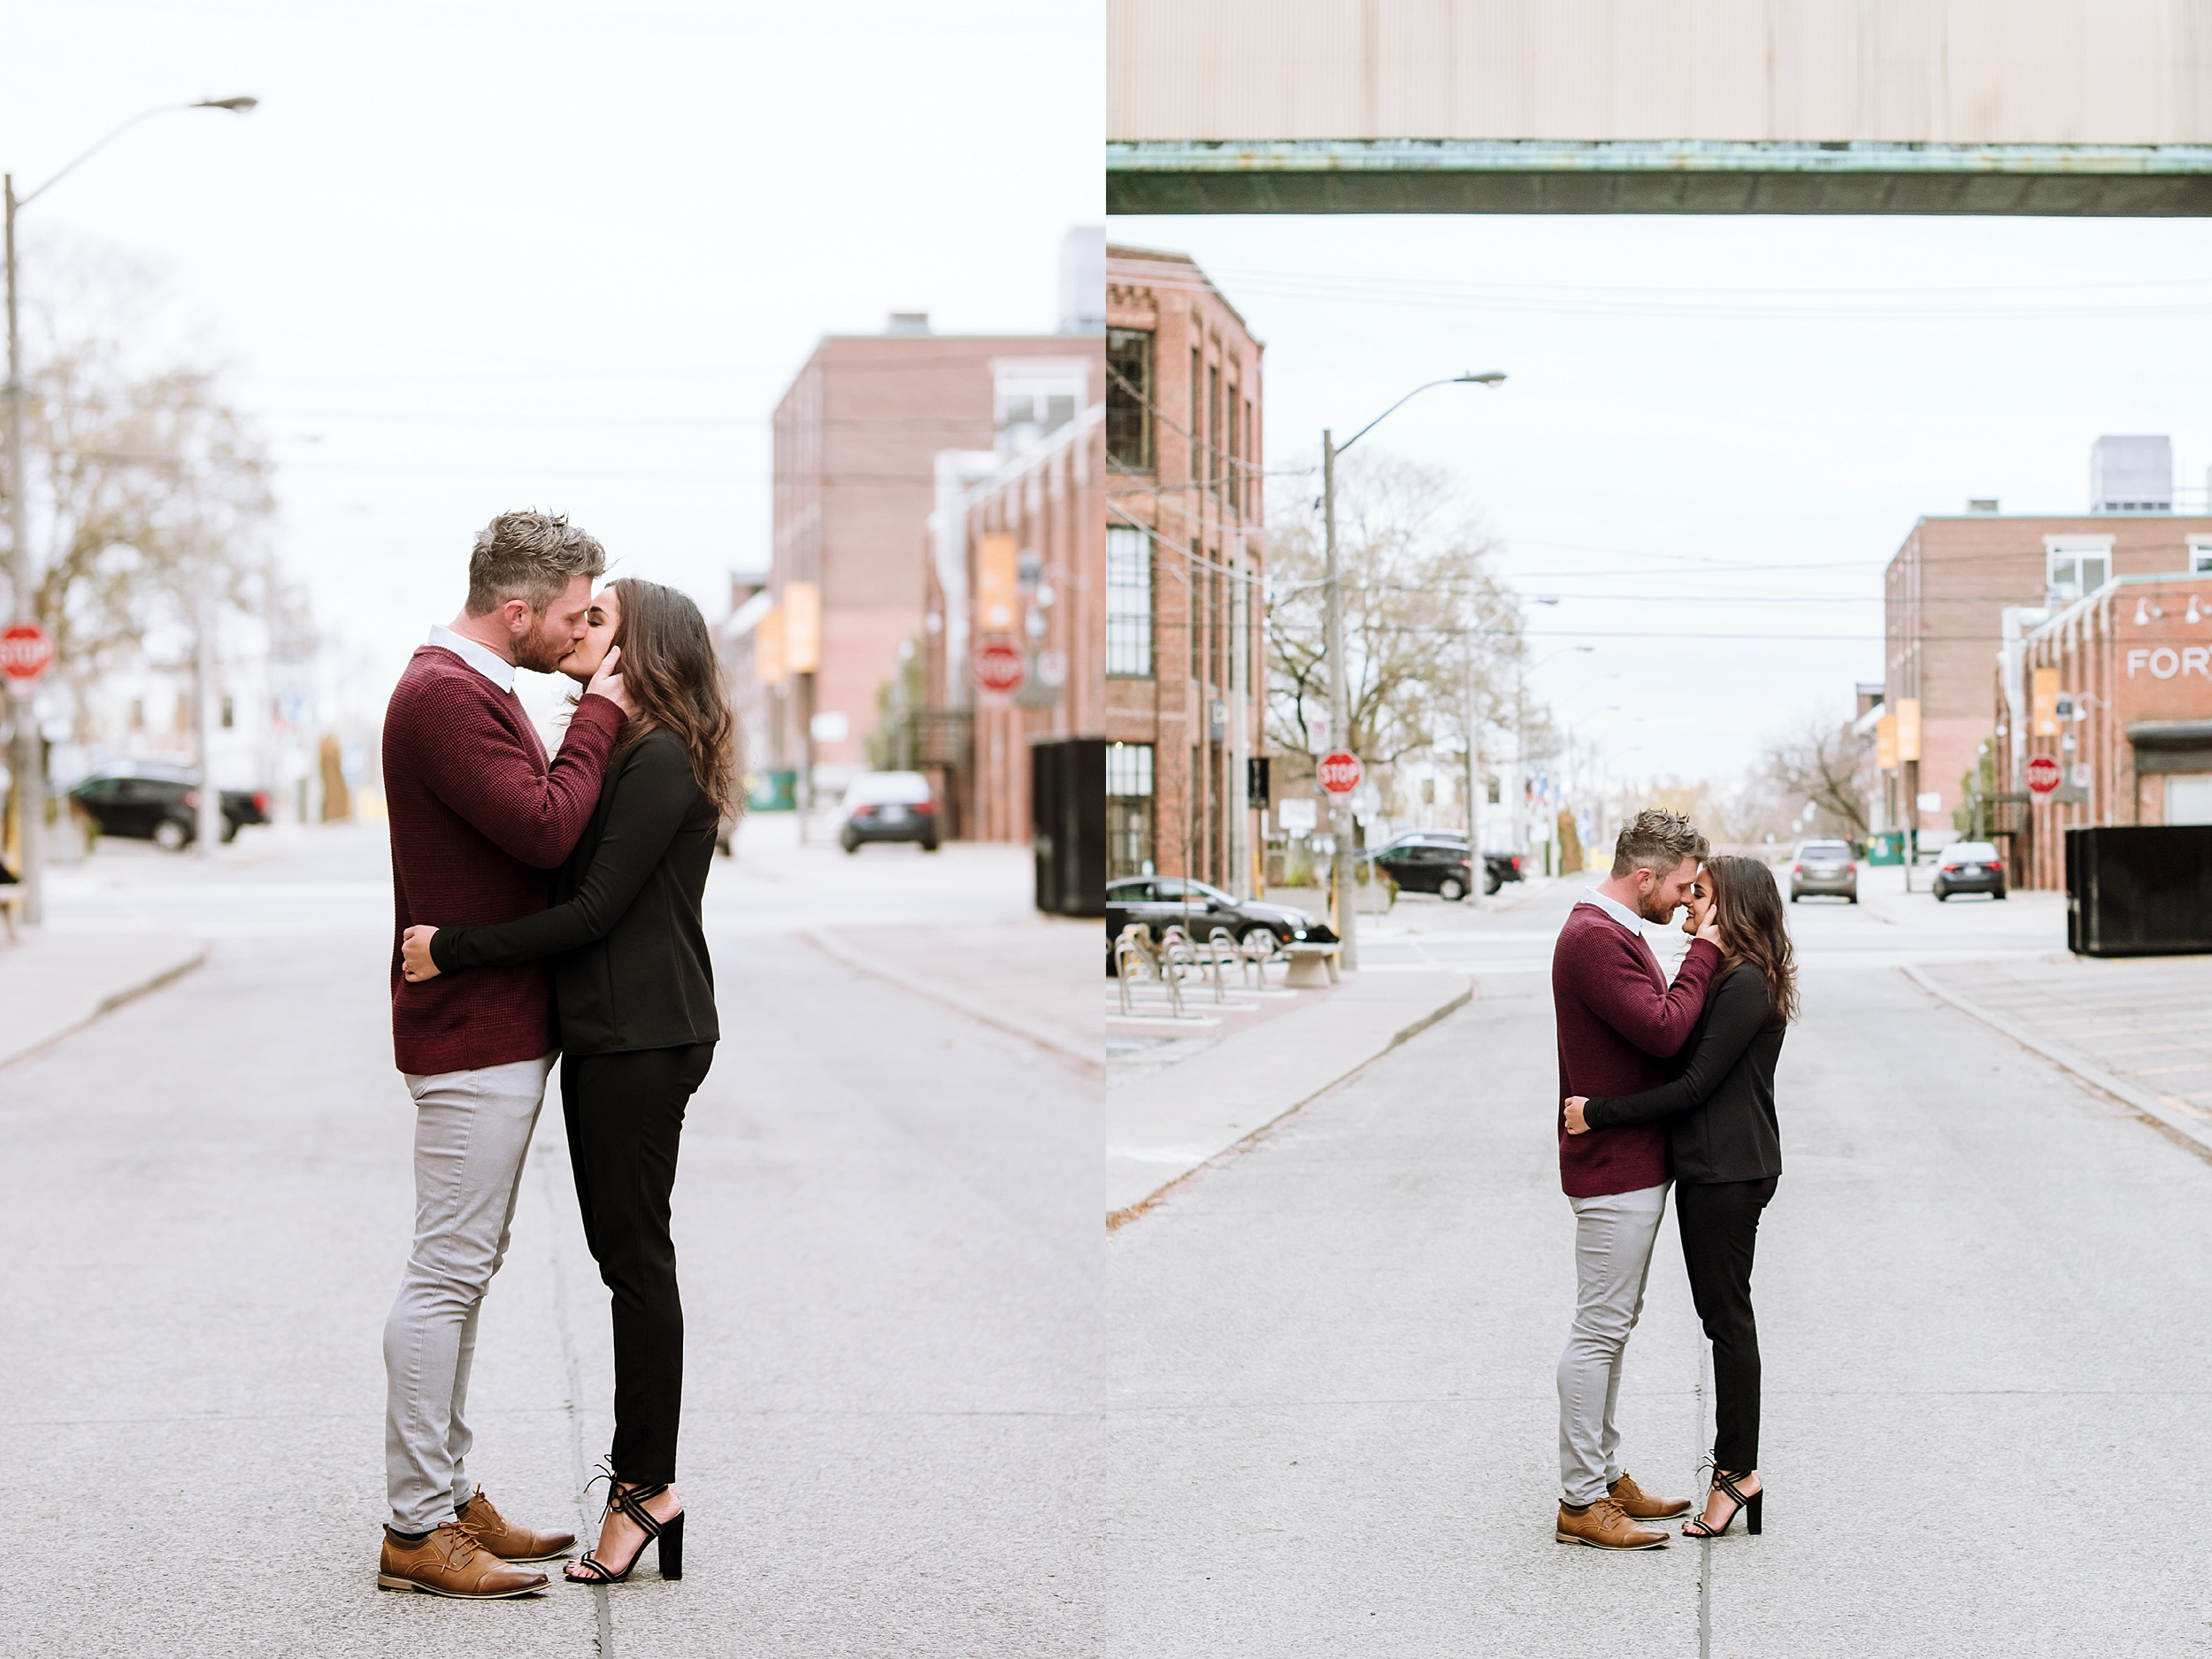 Liberty_Village_Engagement_Shoot_Toronto_Photographer_0002.jpg